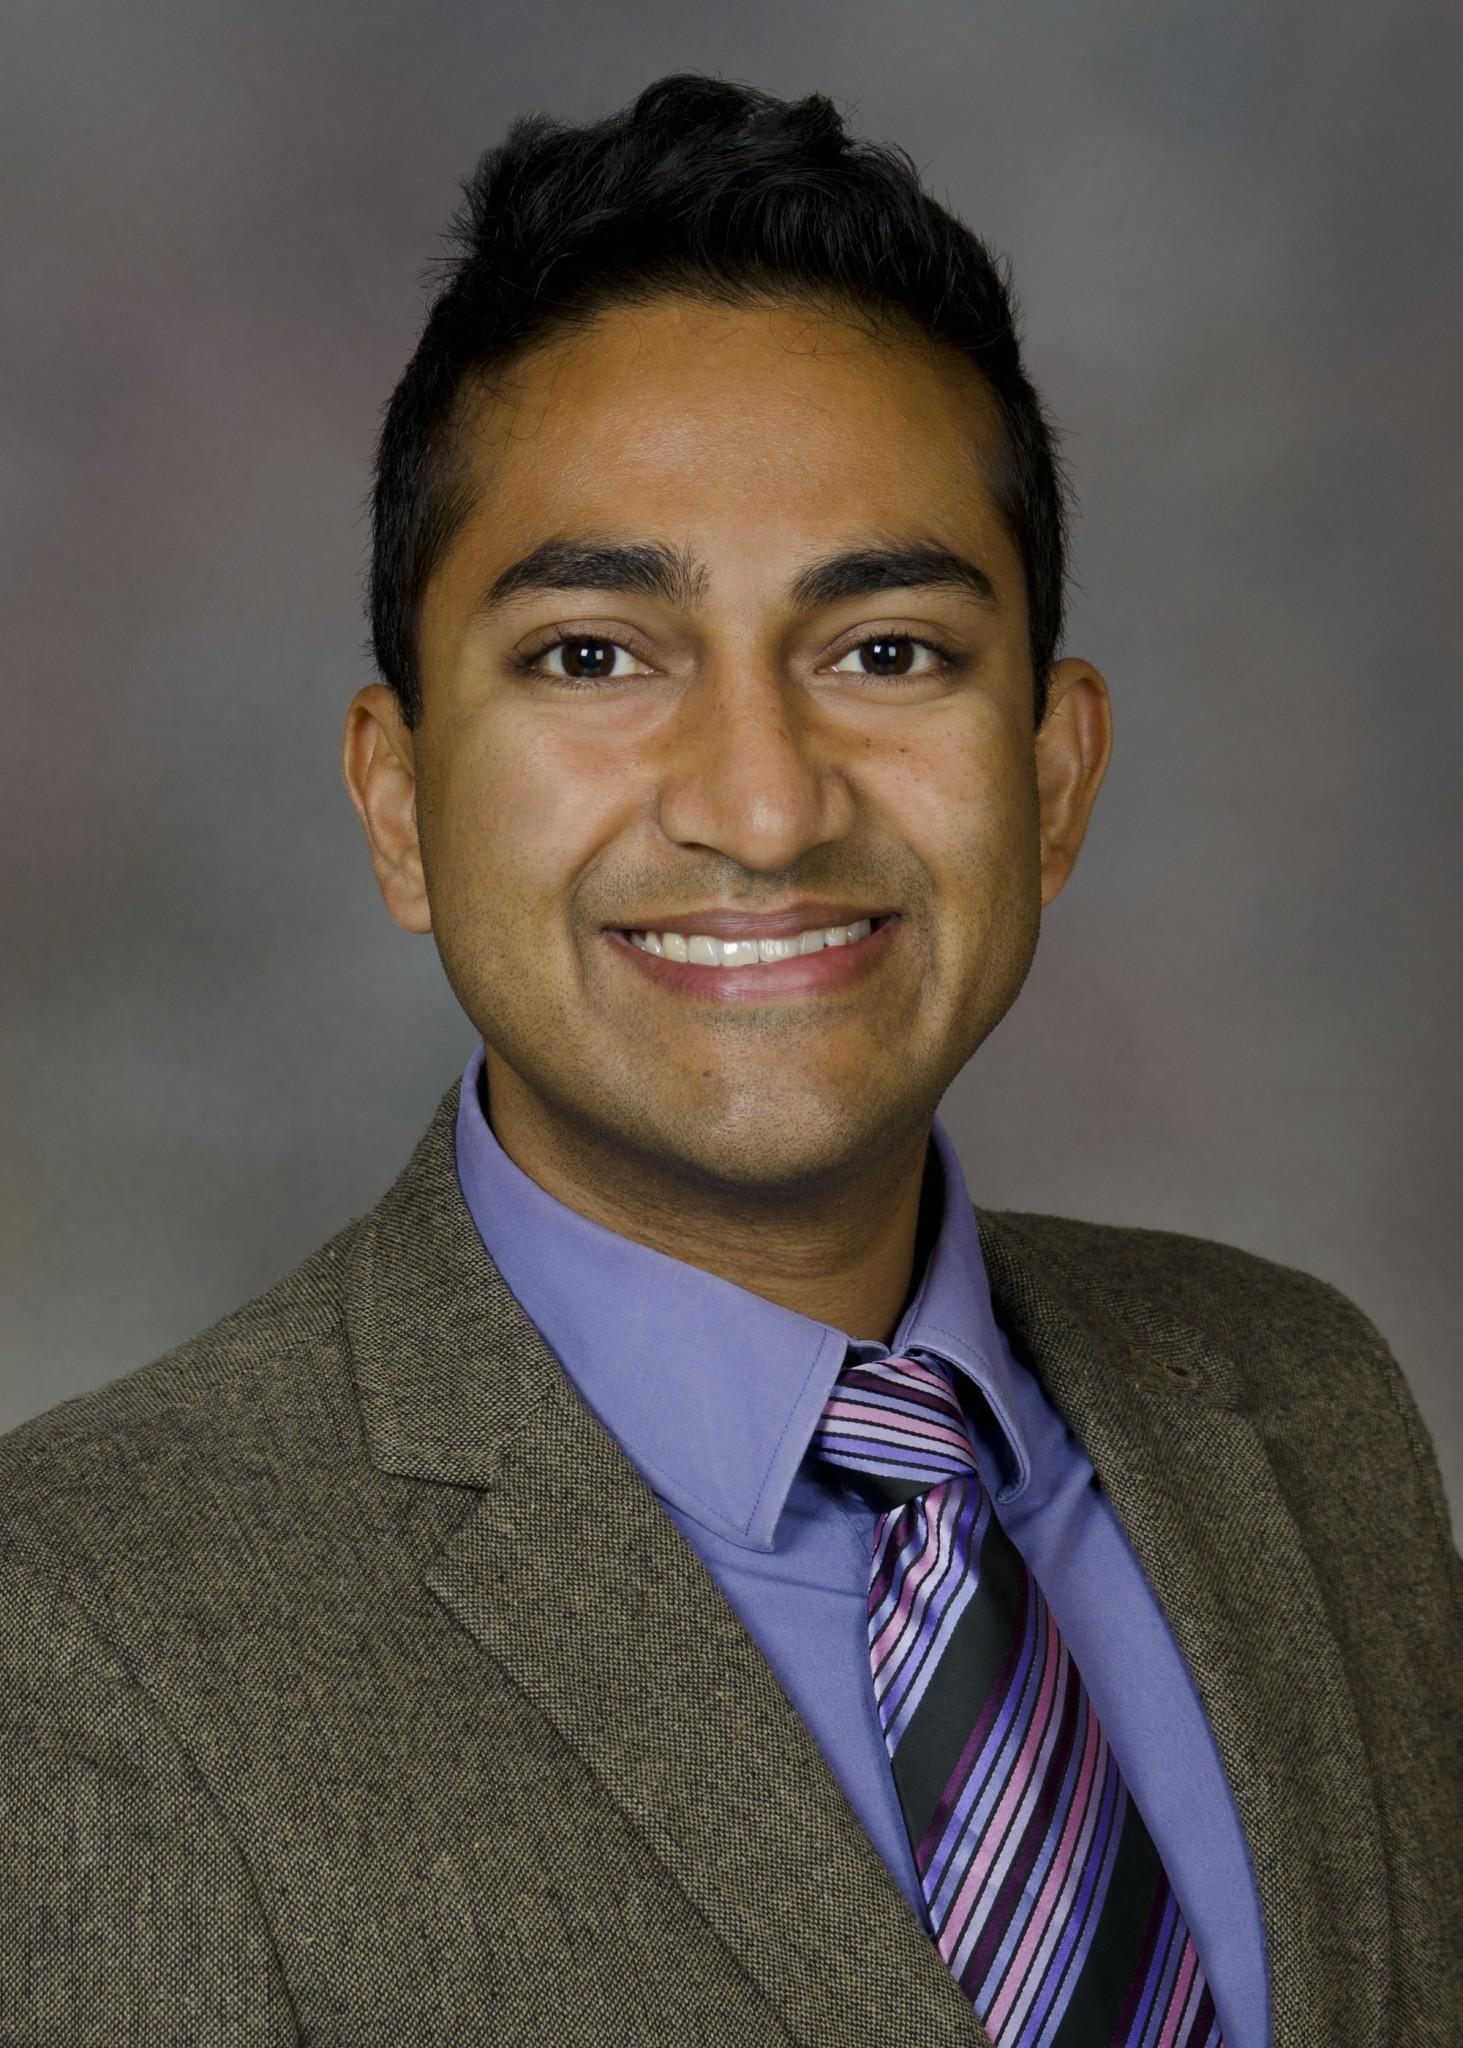 Vinay Prasad